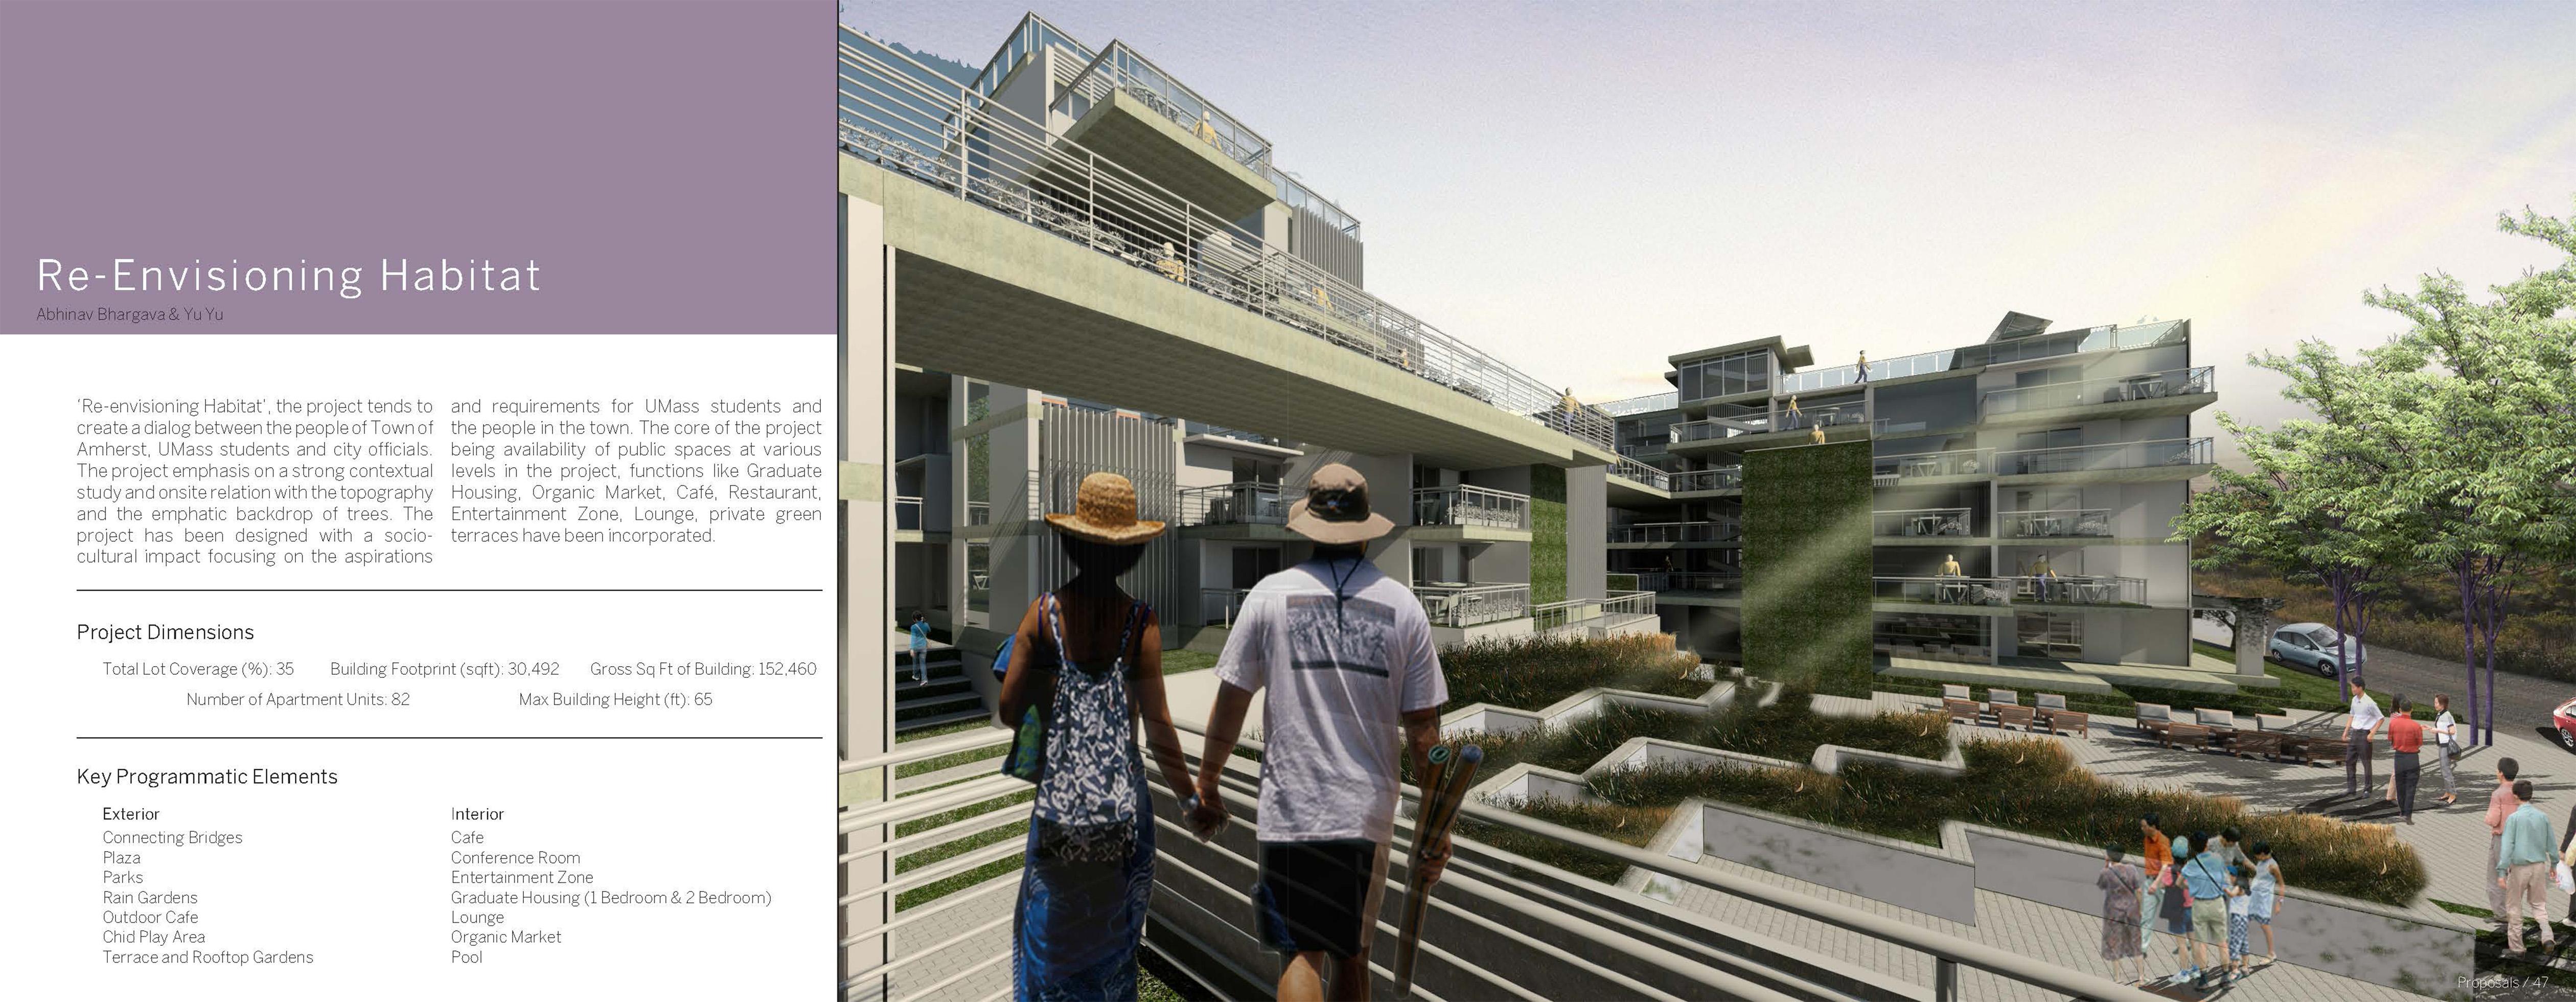 Re-Envisioning Habitat - Abhinav Bhargava & Yu Yu